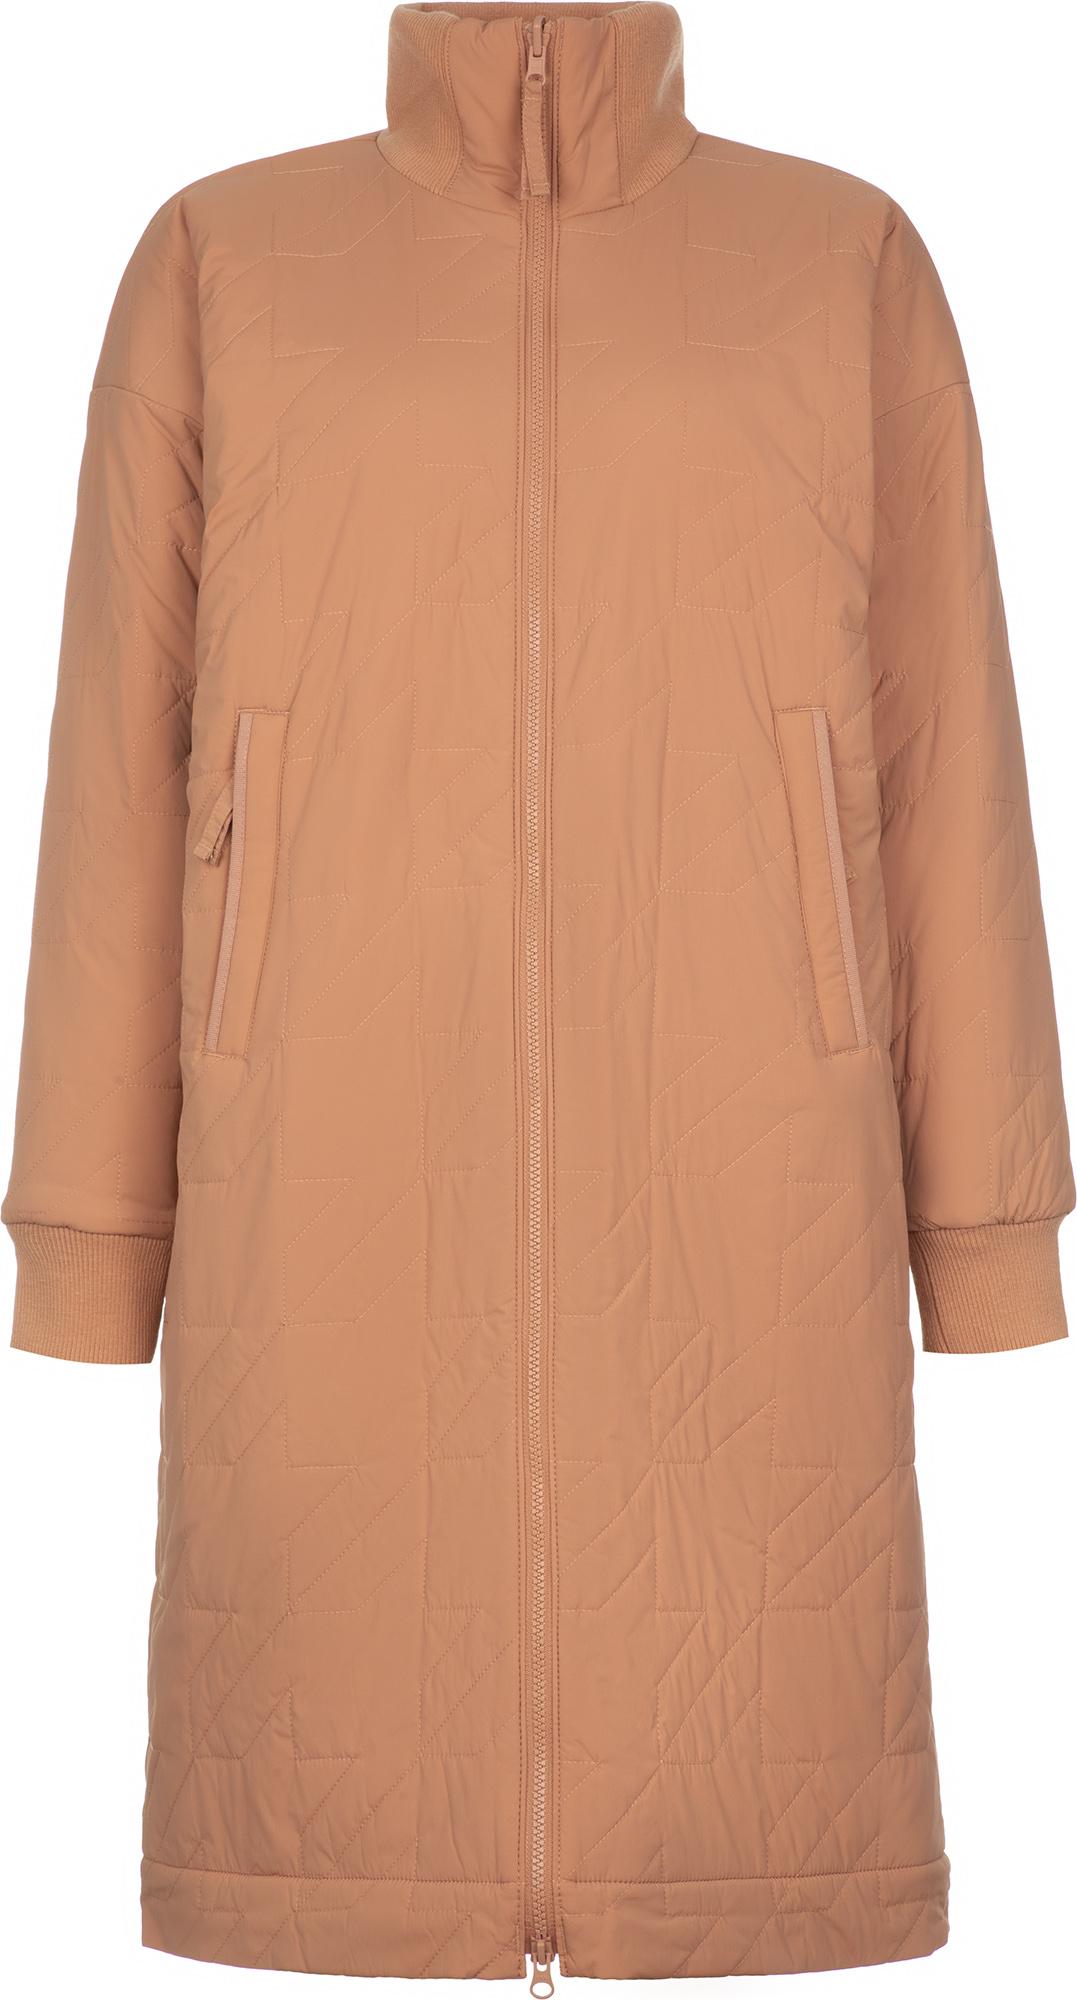 Columbia Куртка утепленная женская Columbia Kinzu Point™, размер 48 columbia куртка columbia falmouth™ размер 48 50